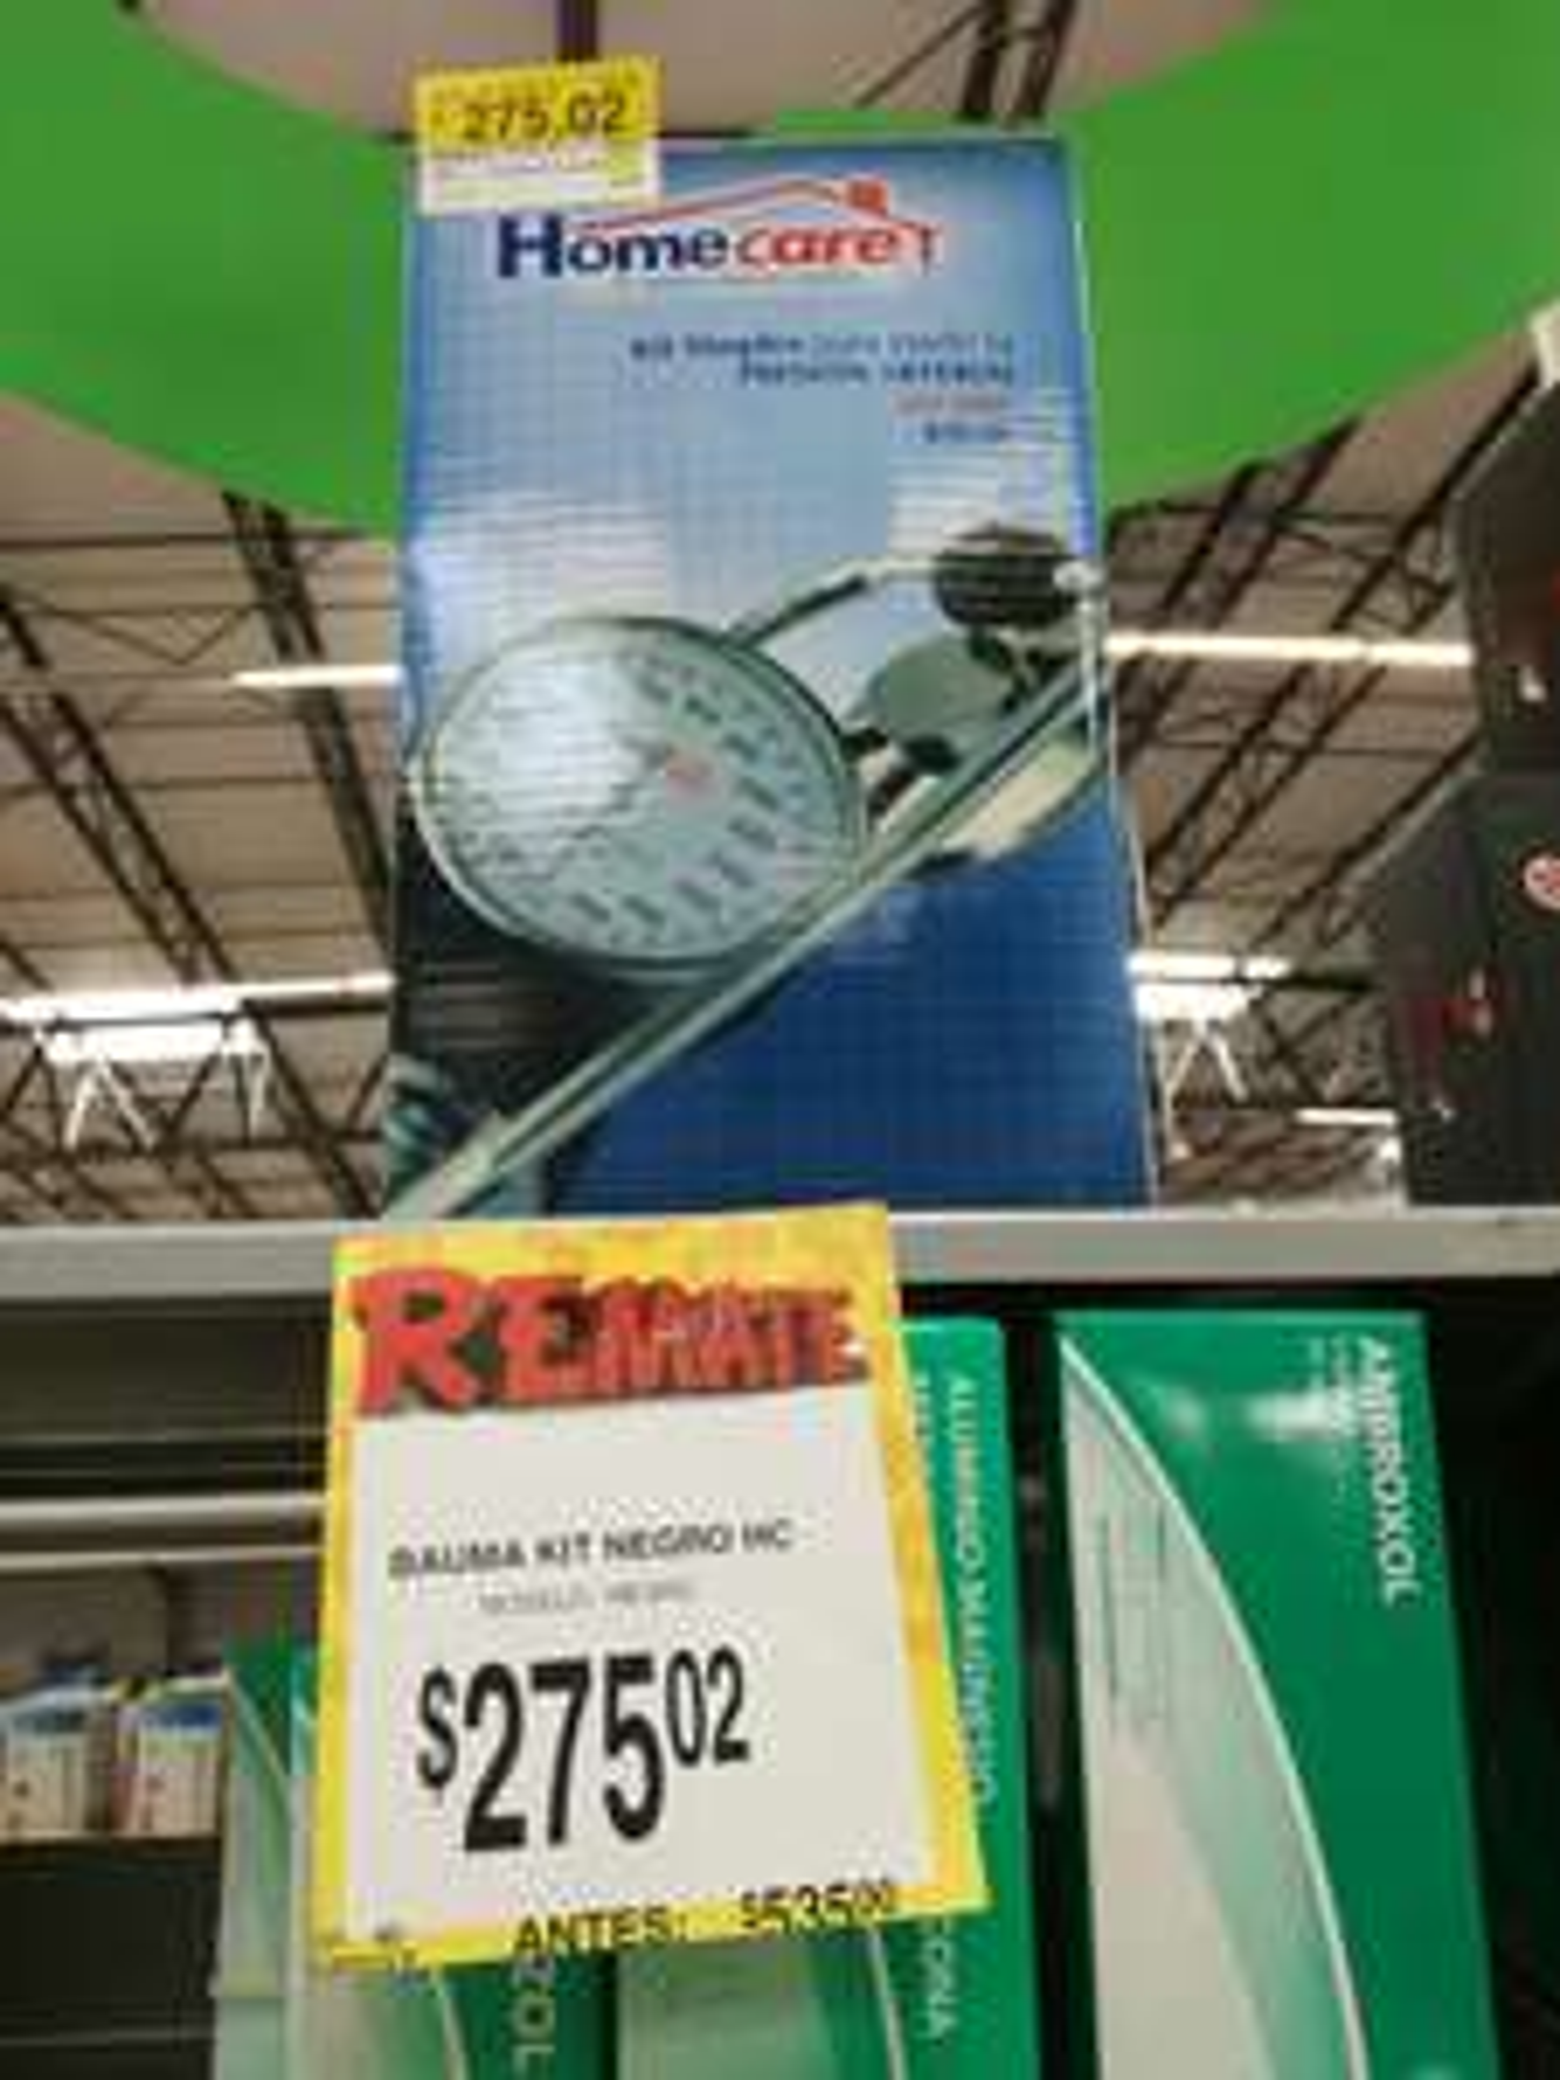 Bodega Aurrerá: Kit Para Medir La Presión a $275.02